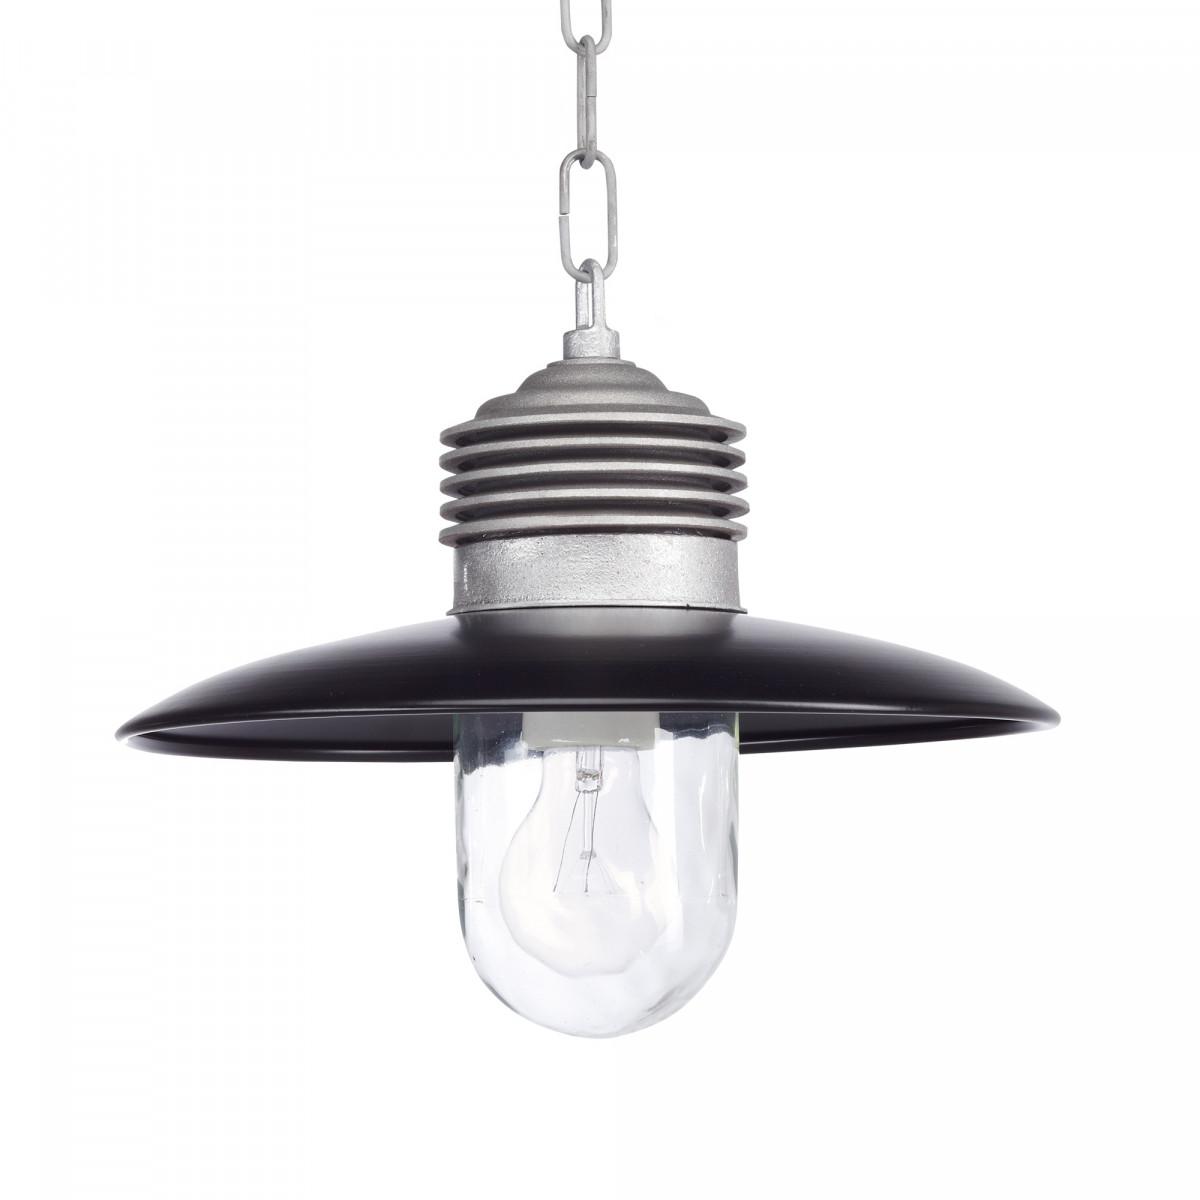 Hanglamp Ampere ketting Alu./Zwart (1199ZD) - KS Verlichting - Stoer & Industrieel